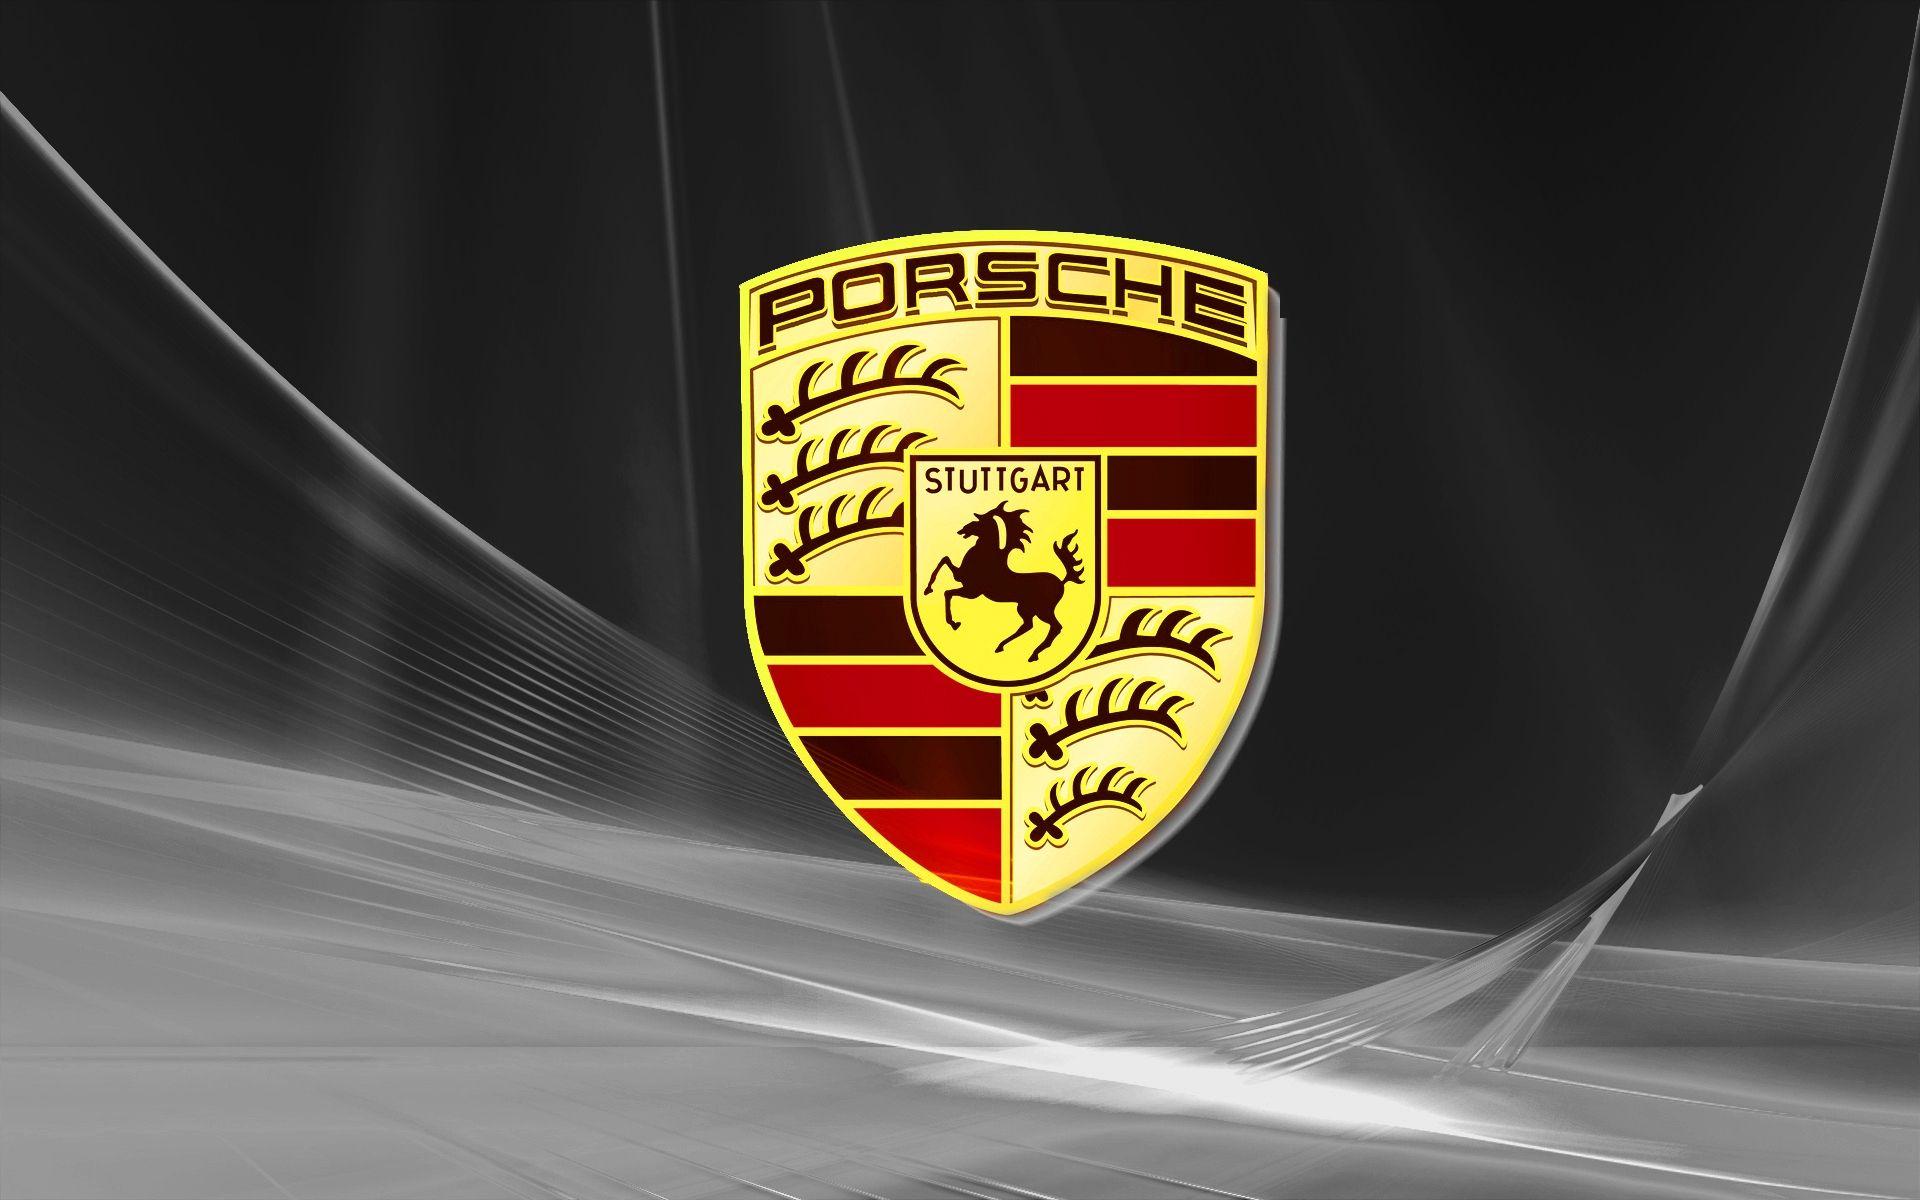 Porsche Logo - Reviews by make & model